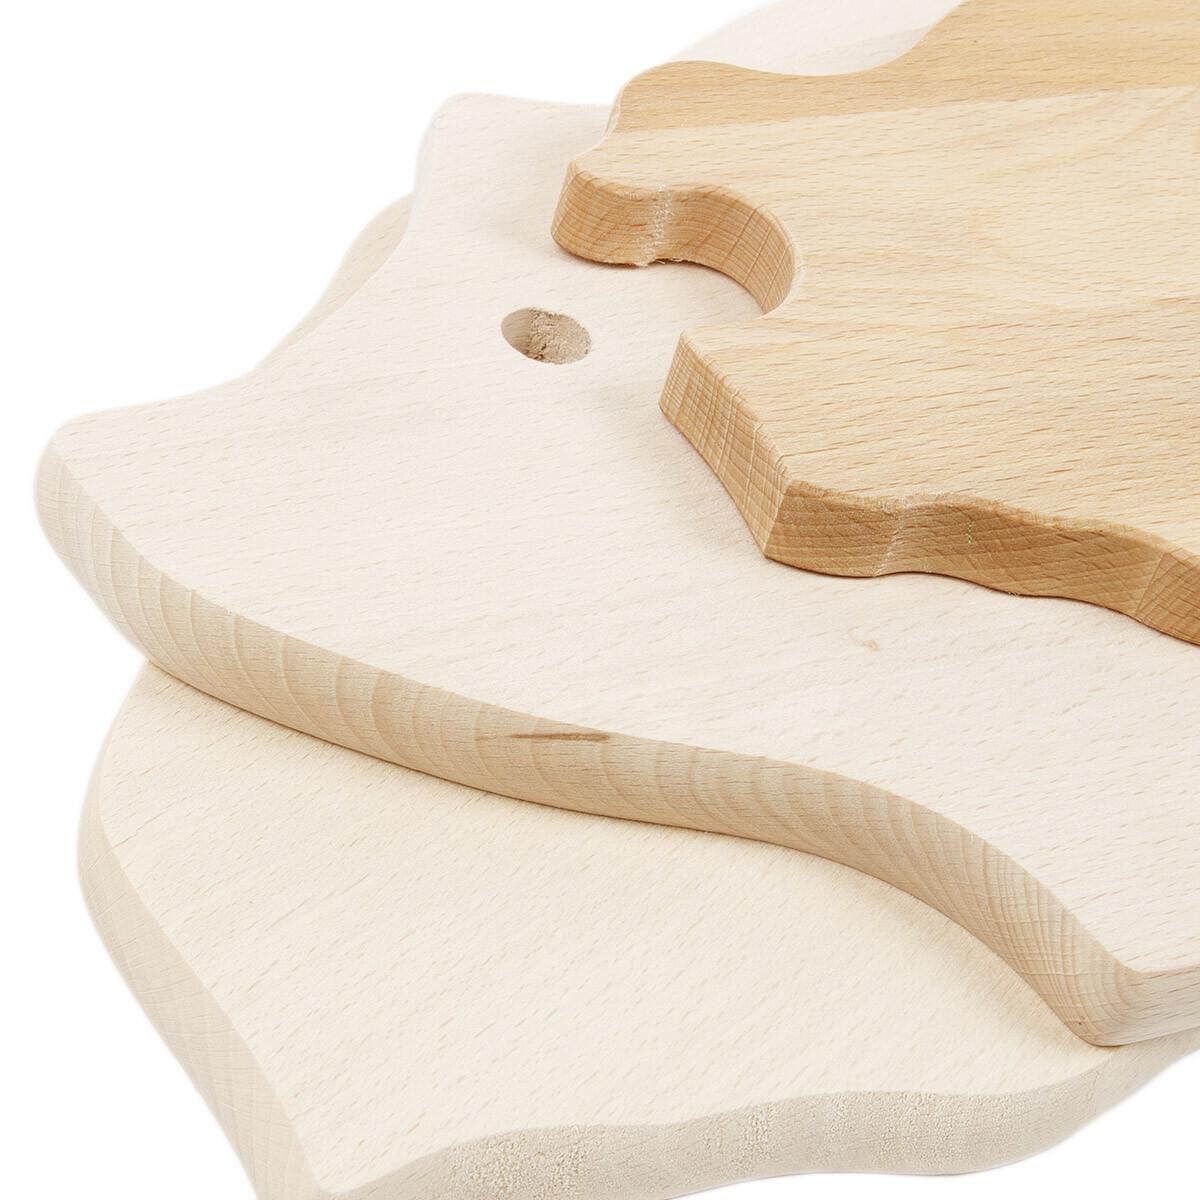 schneidebrett fisch fischbrett fr hst cksbrettchen holz hol. Black Bedroom Furniture Sets. Home Design Ideas